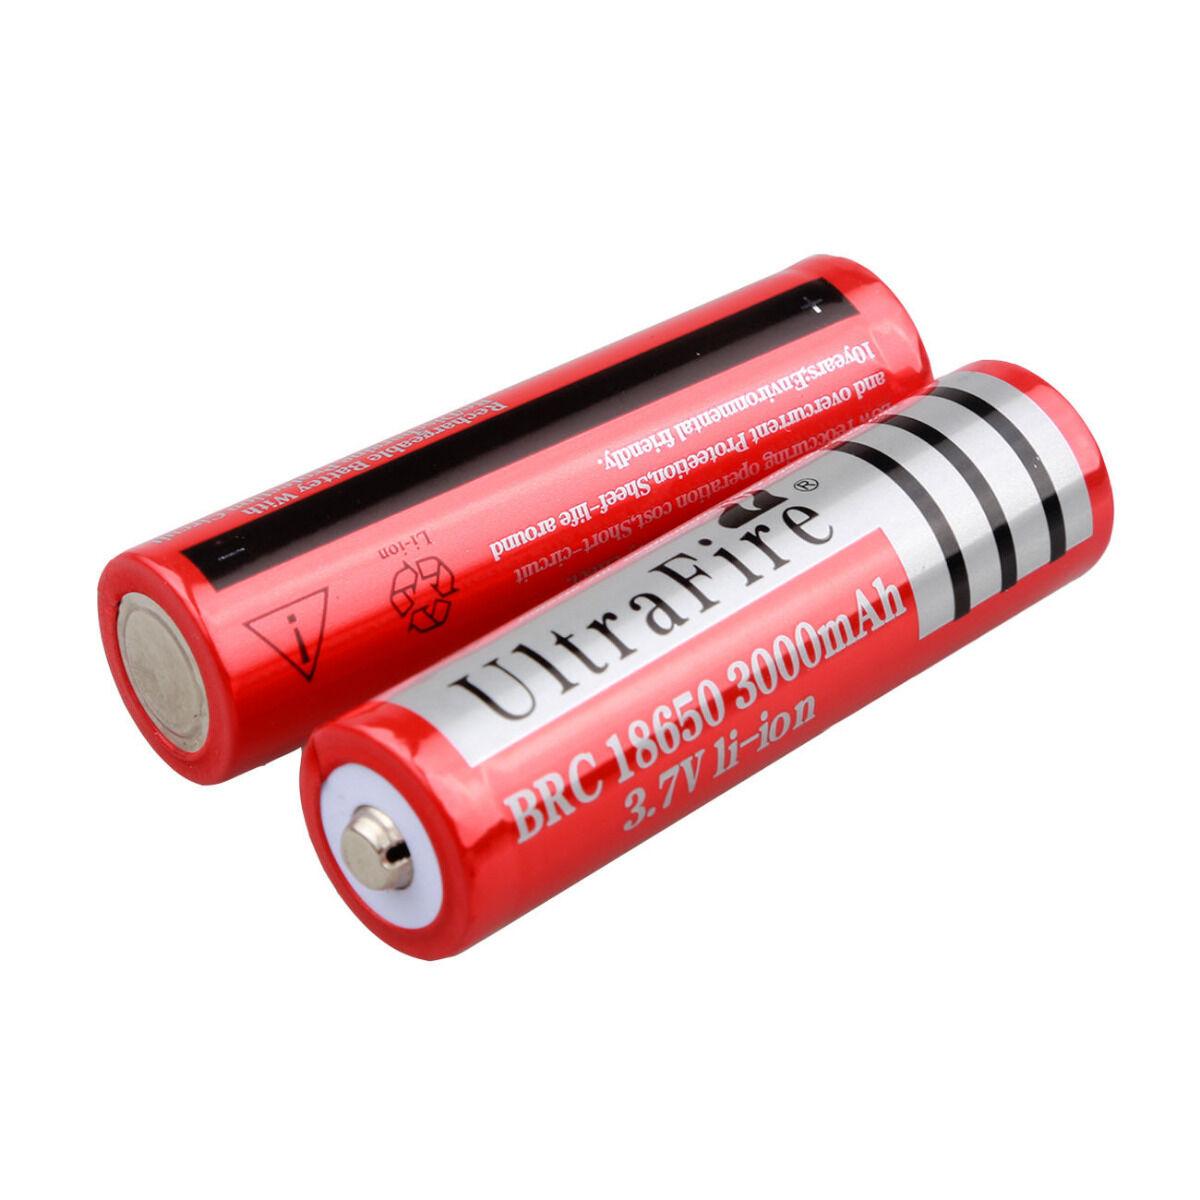 2pcs 3.7V 3000mAH Rechargeable Red Li-ion Lithium 18650 Batt